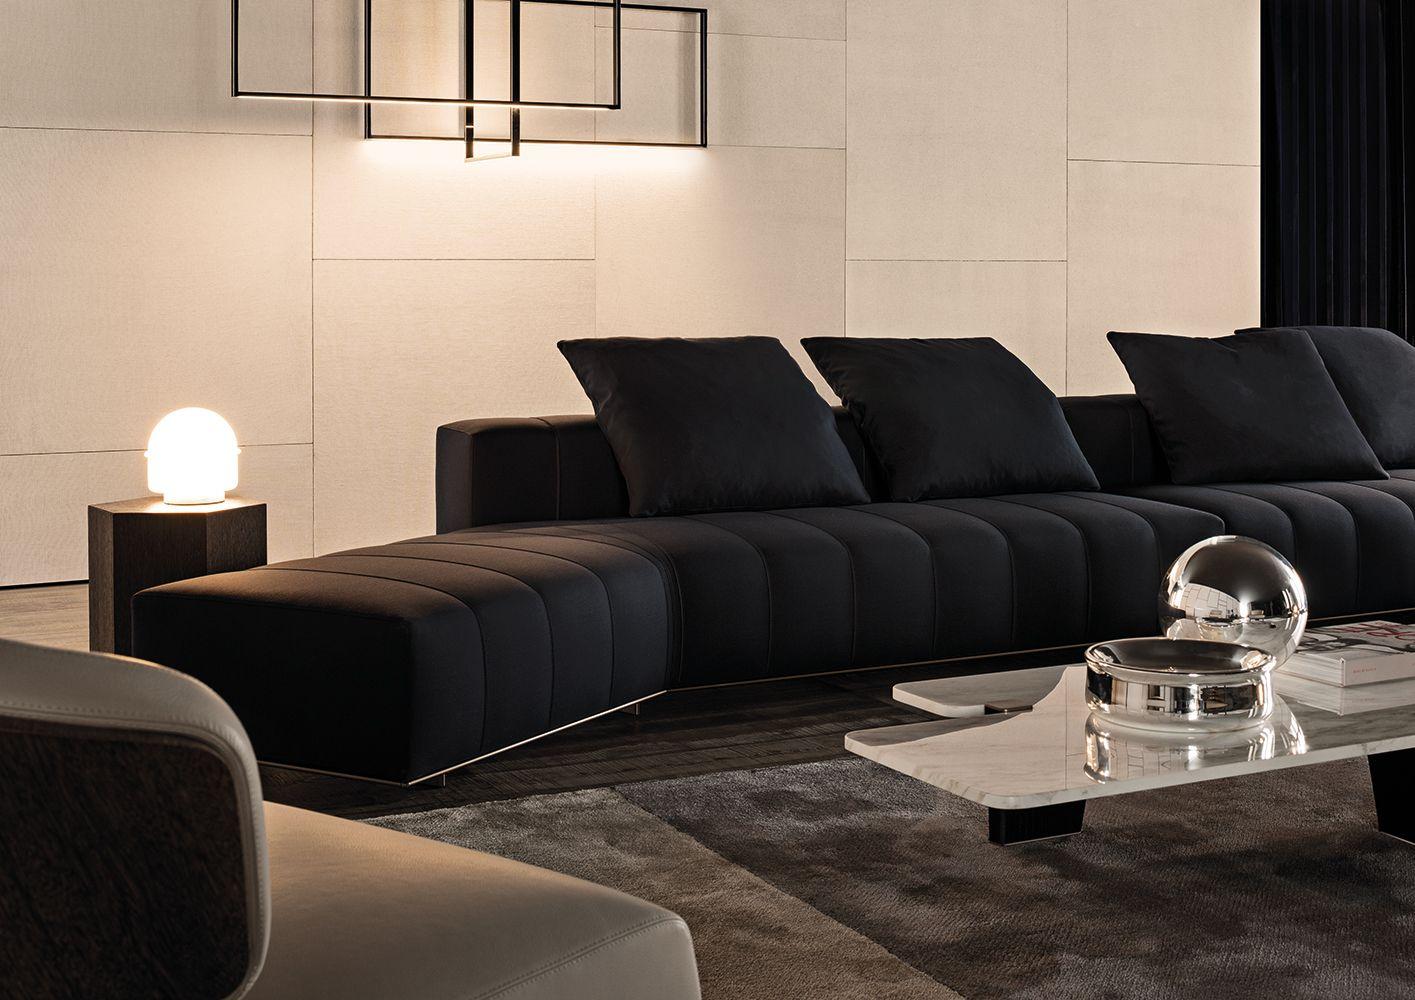 Minotti Ipad Freeman Lounge Sofas En Lounge Sofa Sofa Price Living Room Spaces